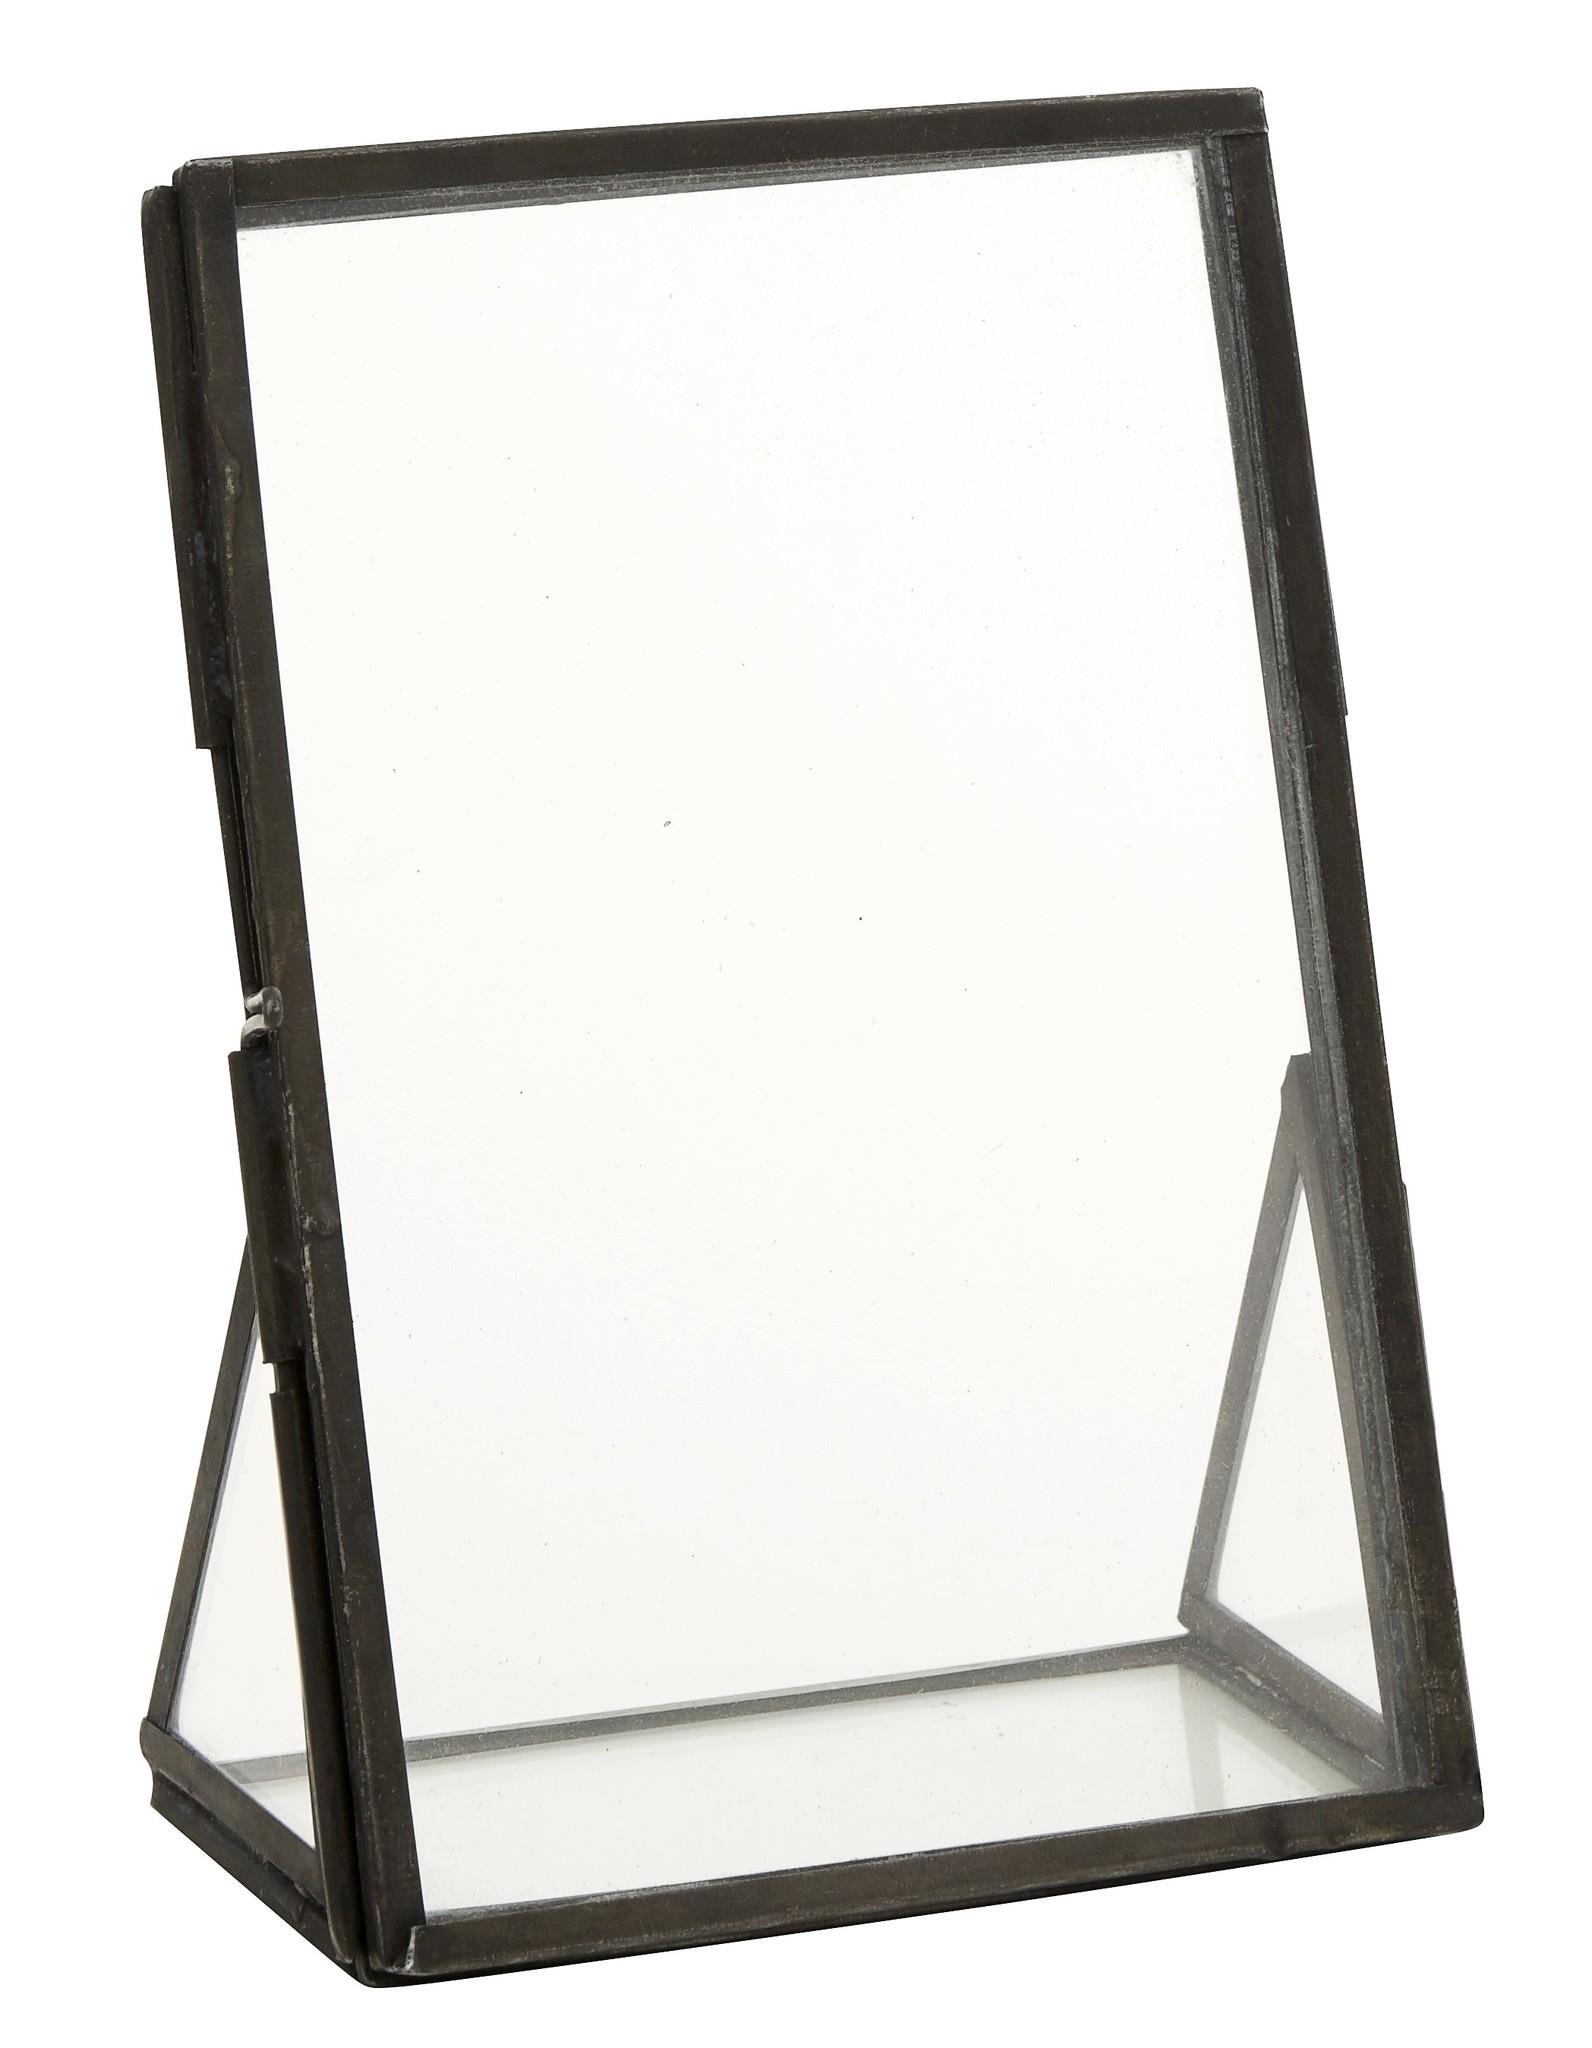 Nordal photo frame standing, black 15x10